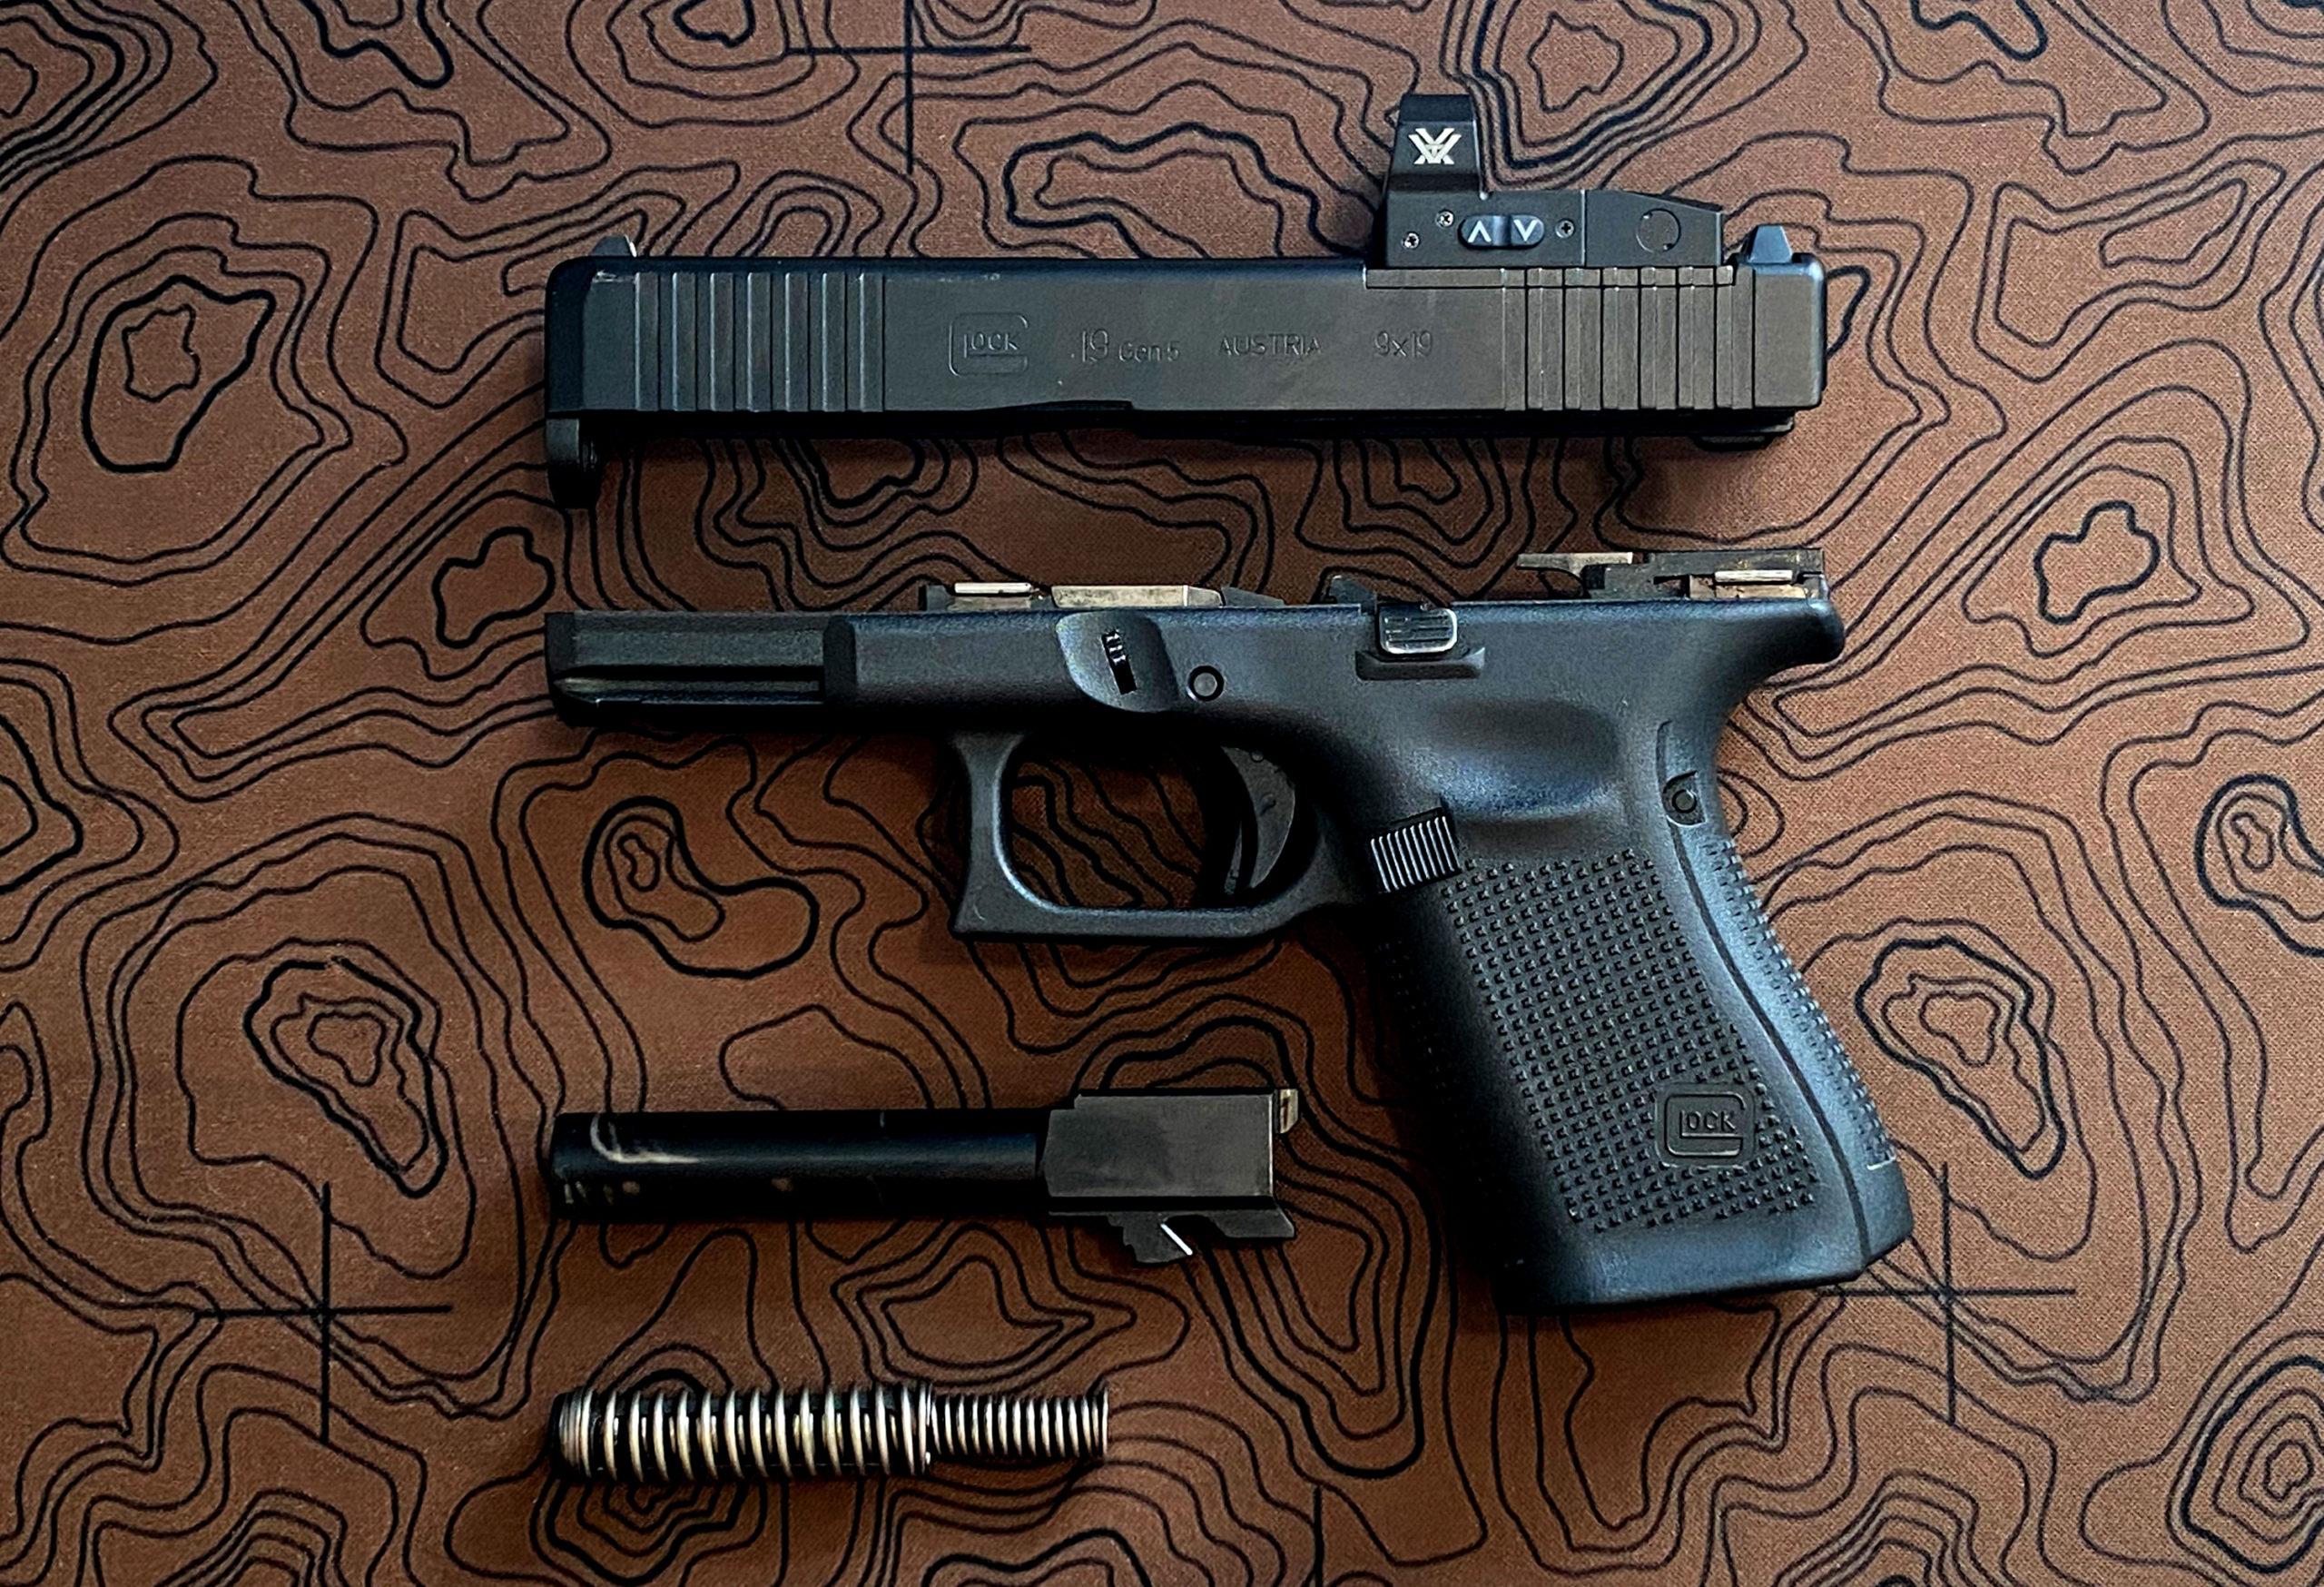 Glock 19 Gen 5 disassembled parts